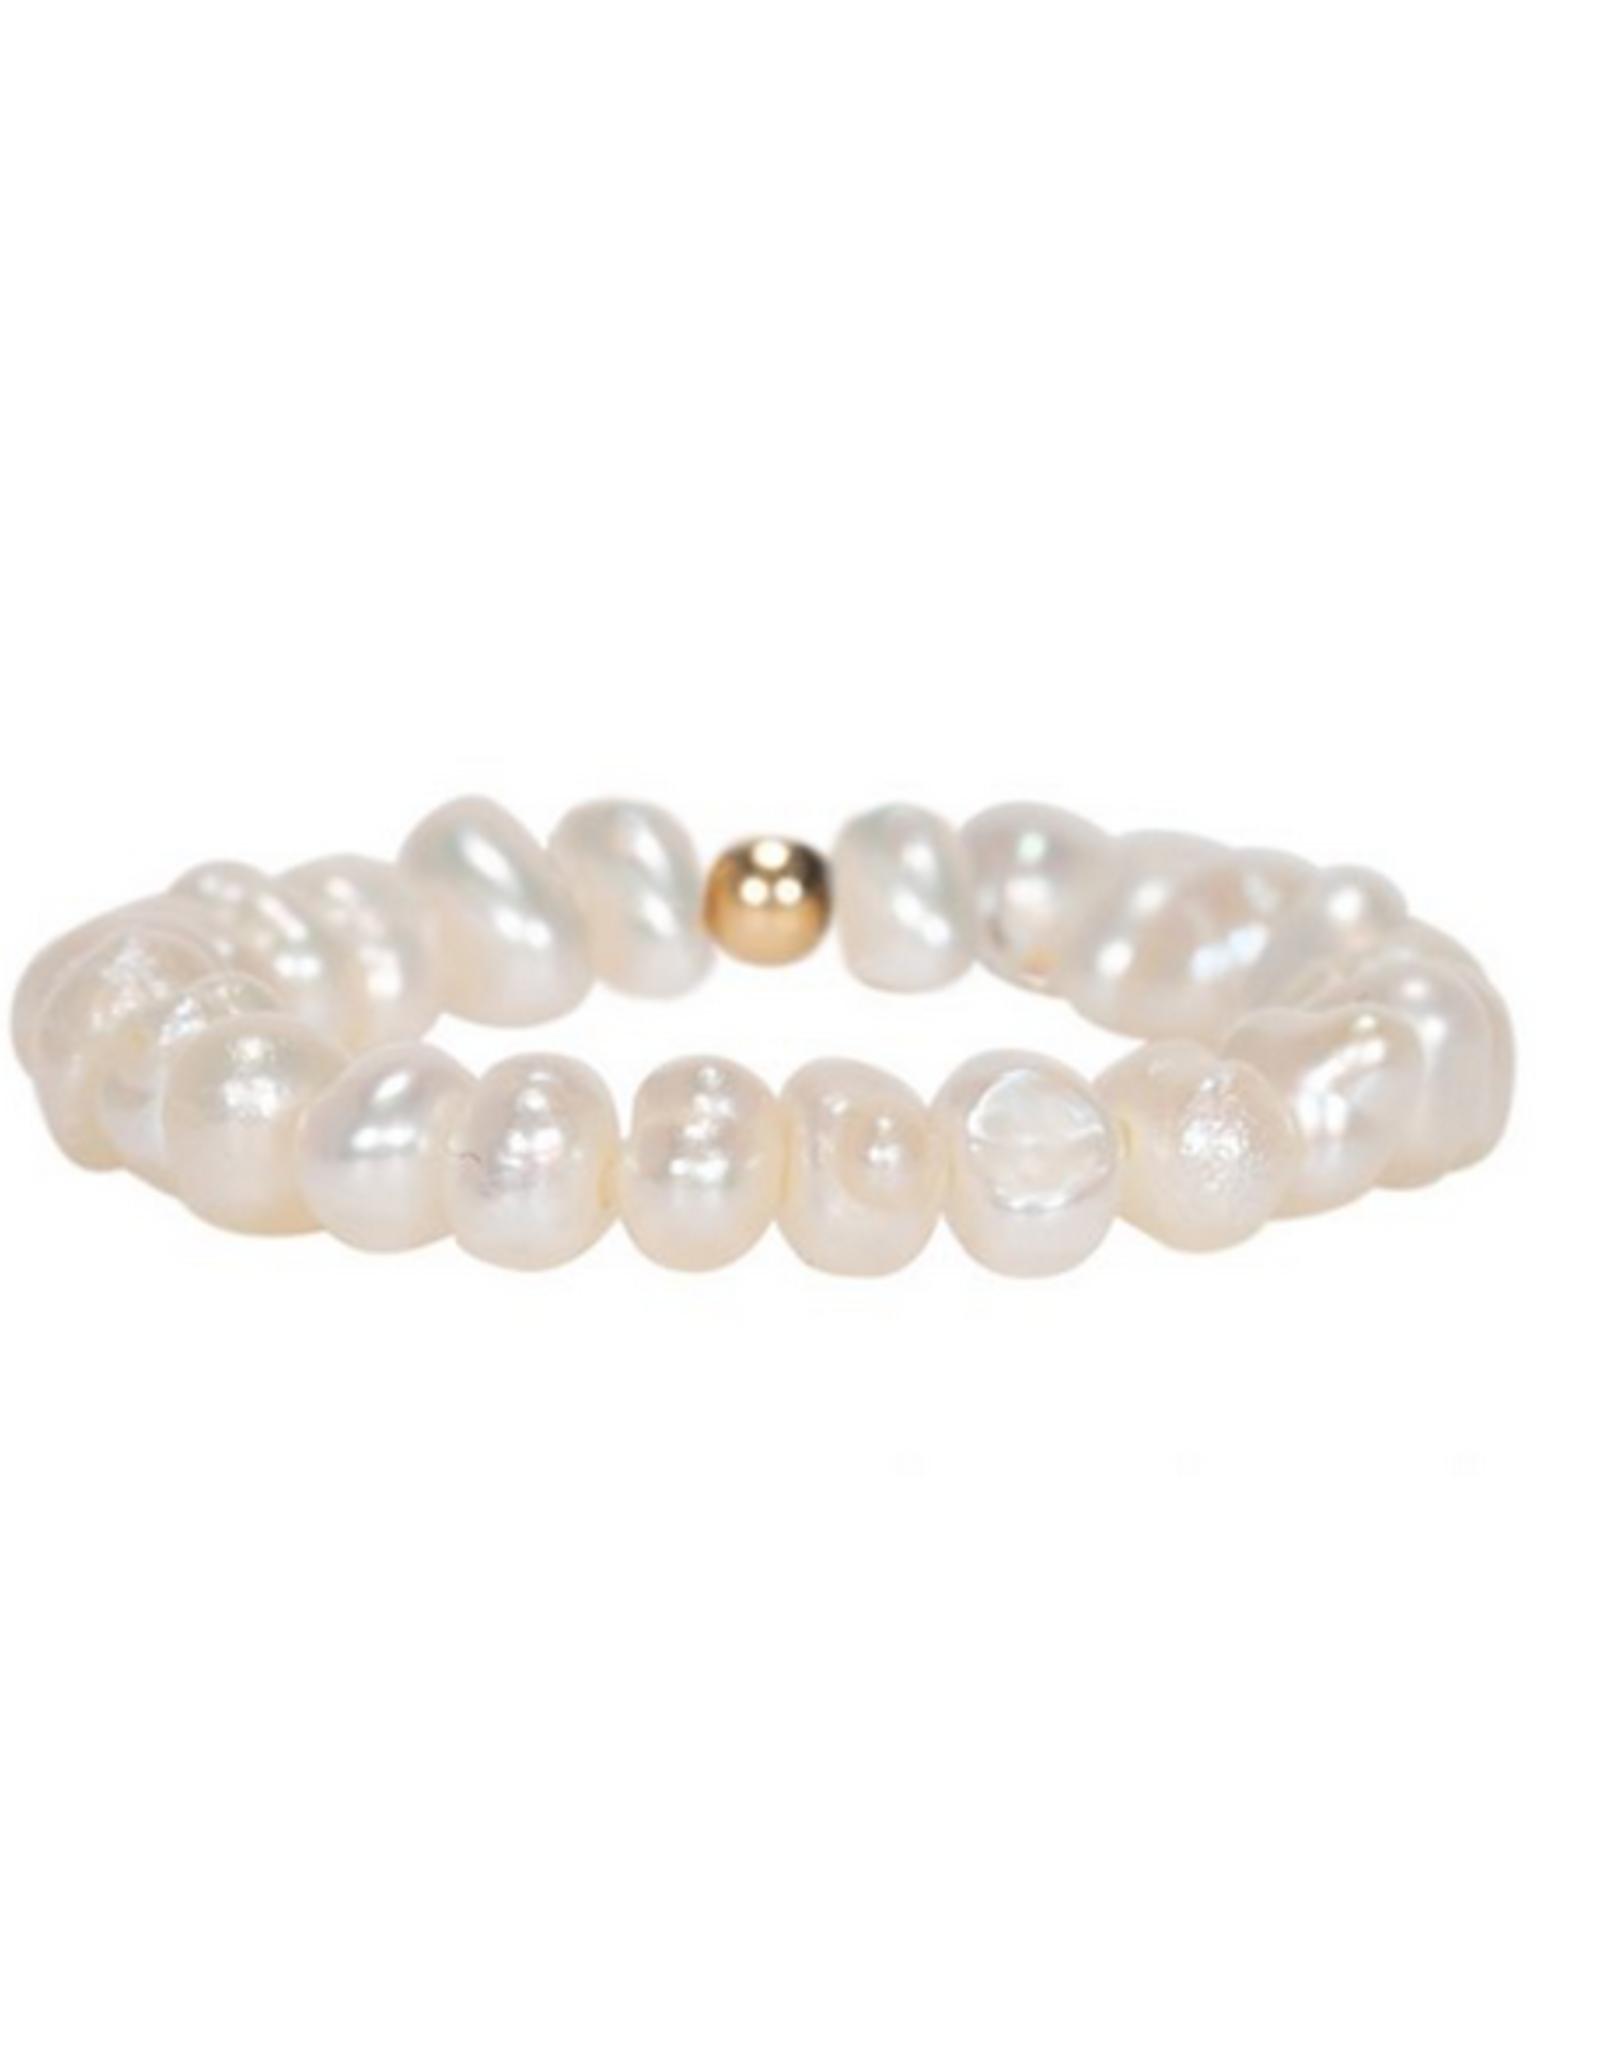 Miab Miab - Ring goud - all pearl - M